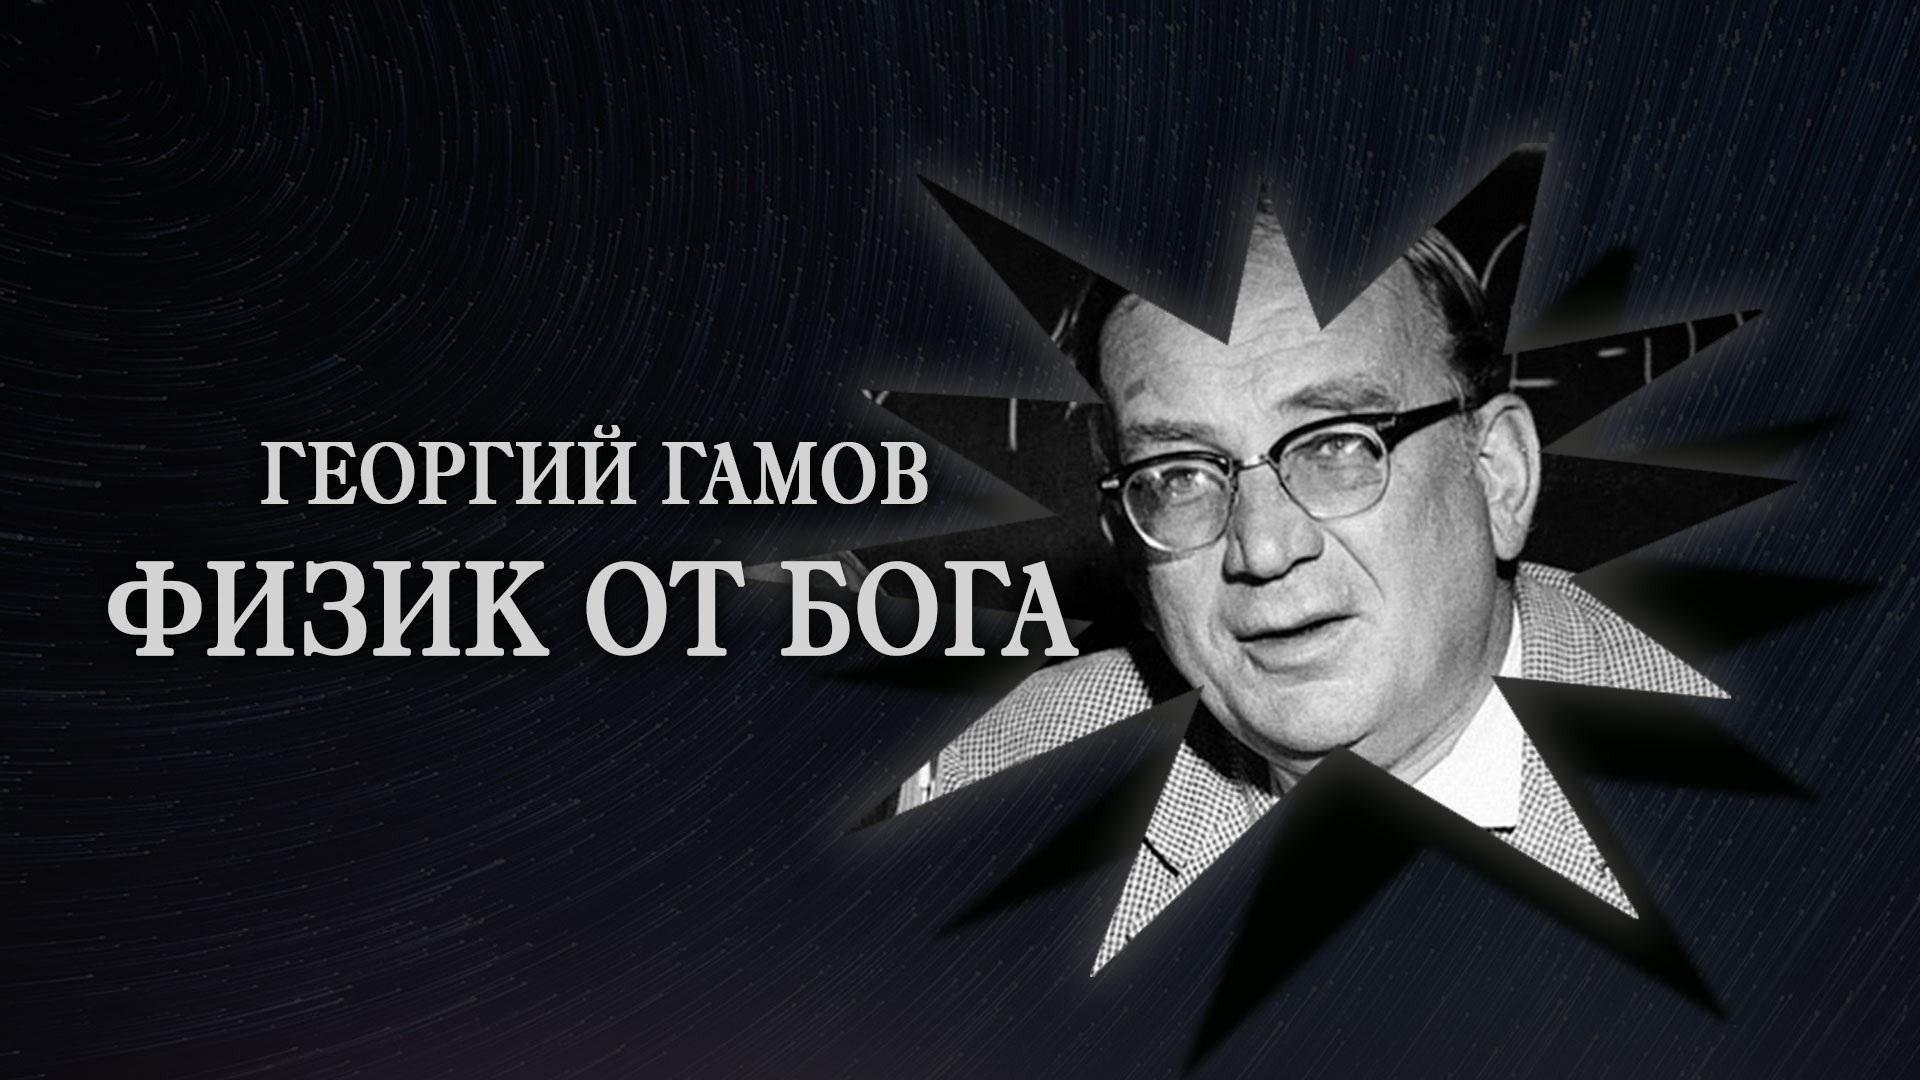 Георгий Гамов. Физик от Бога